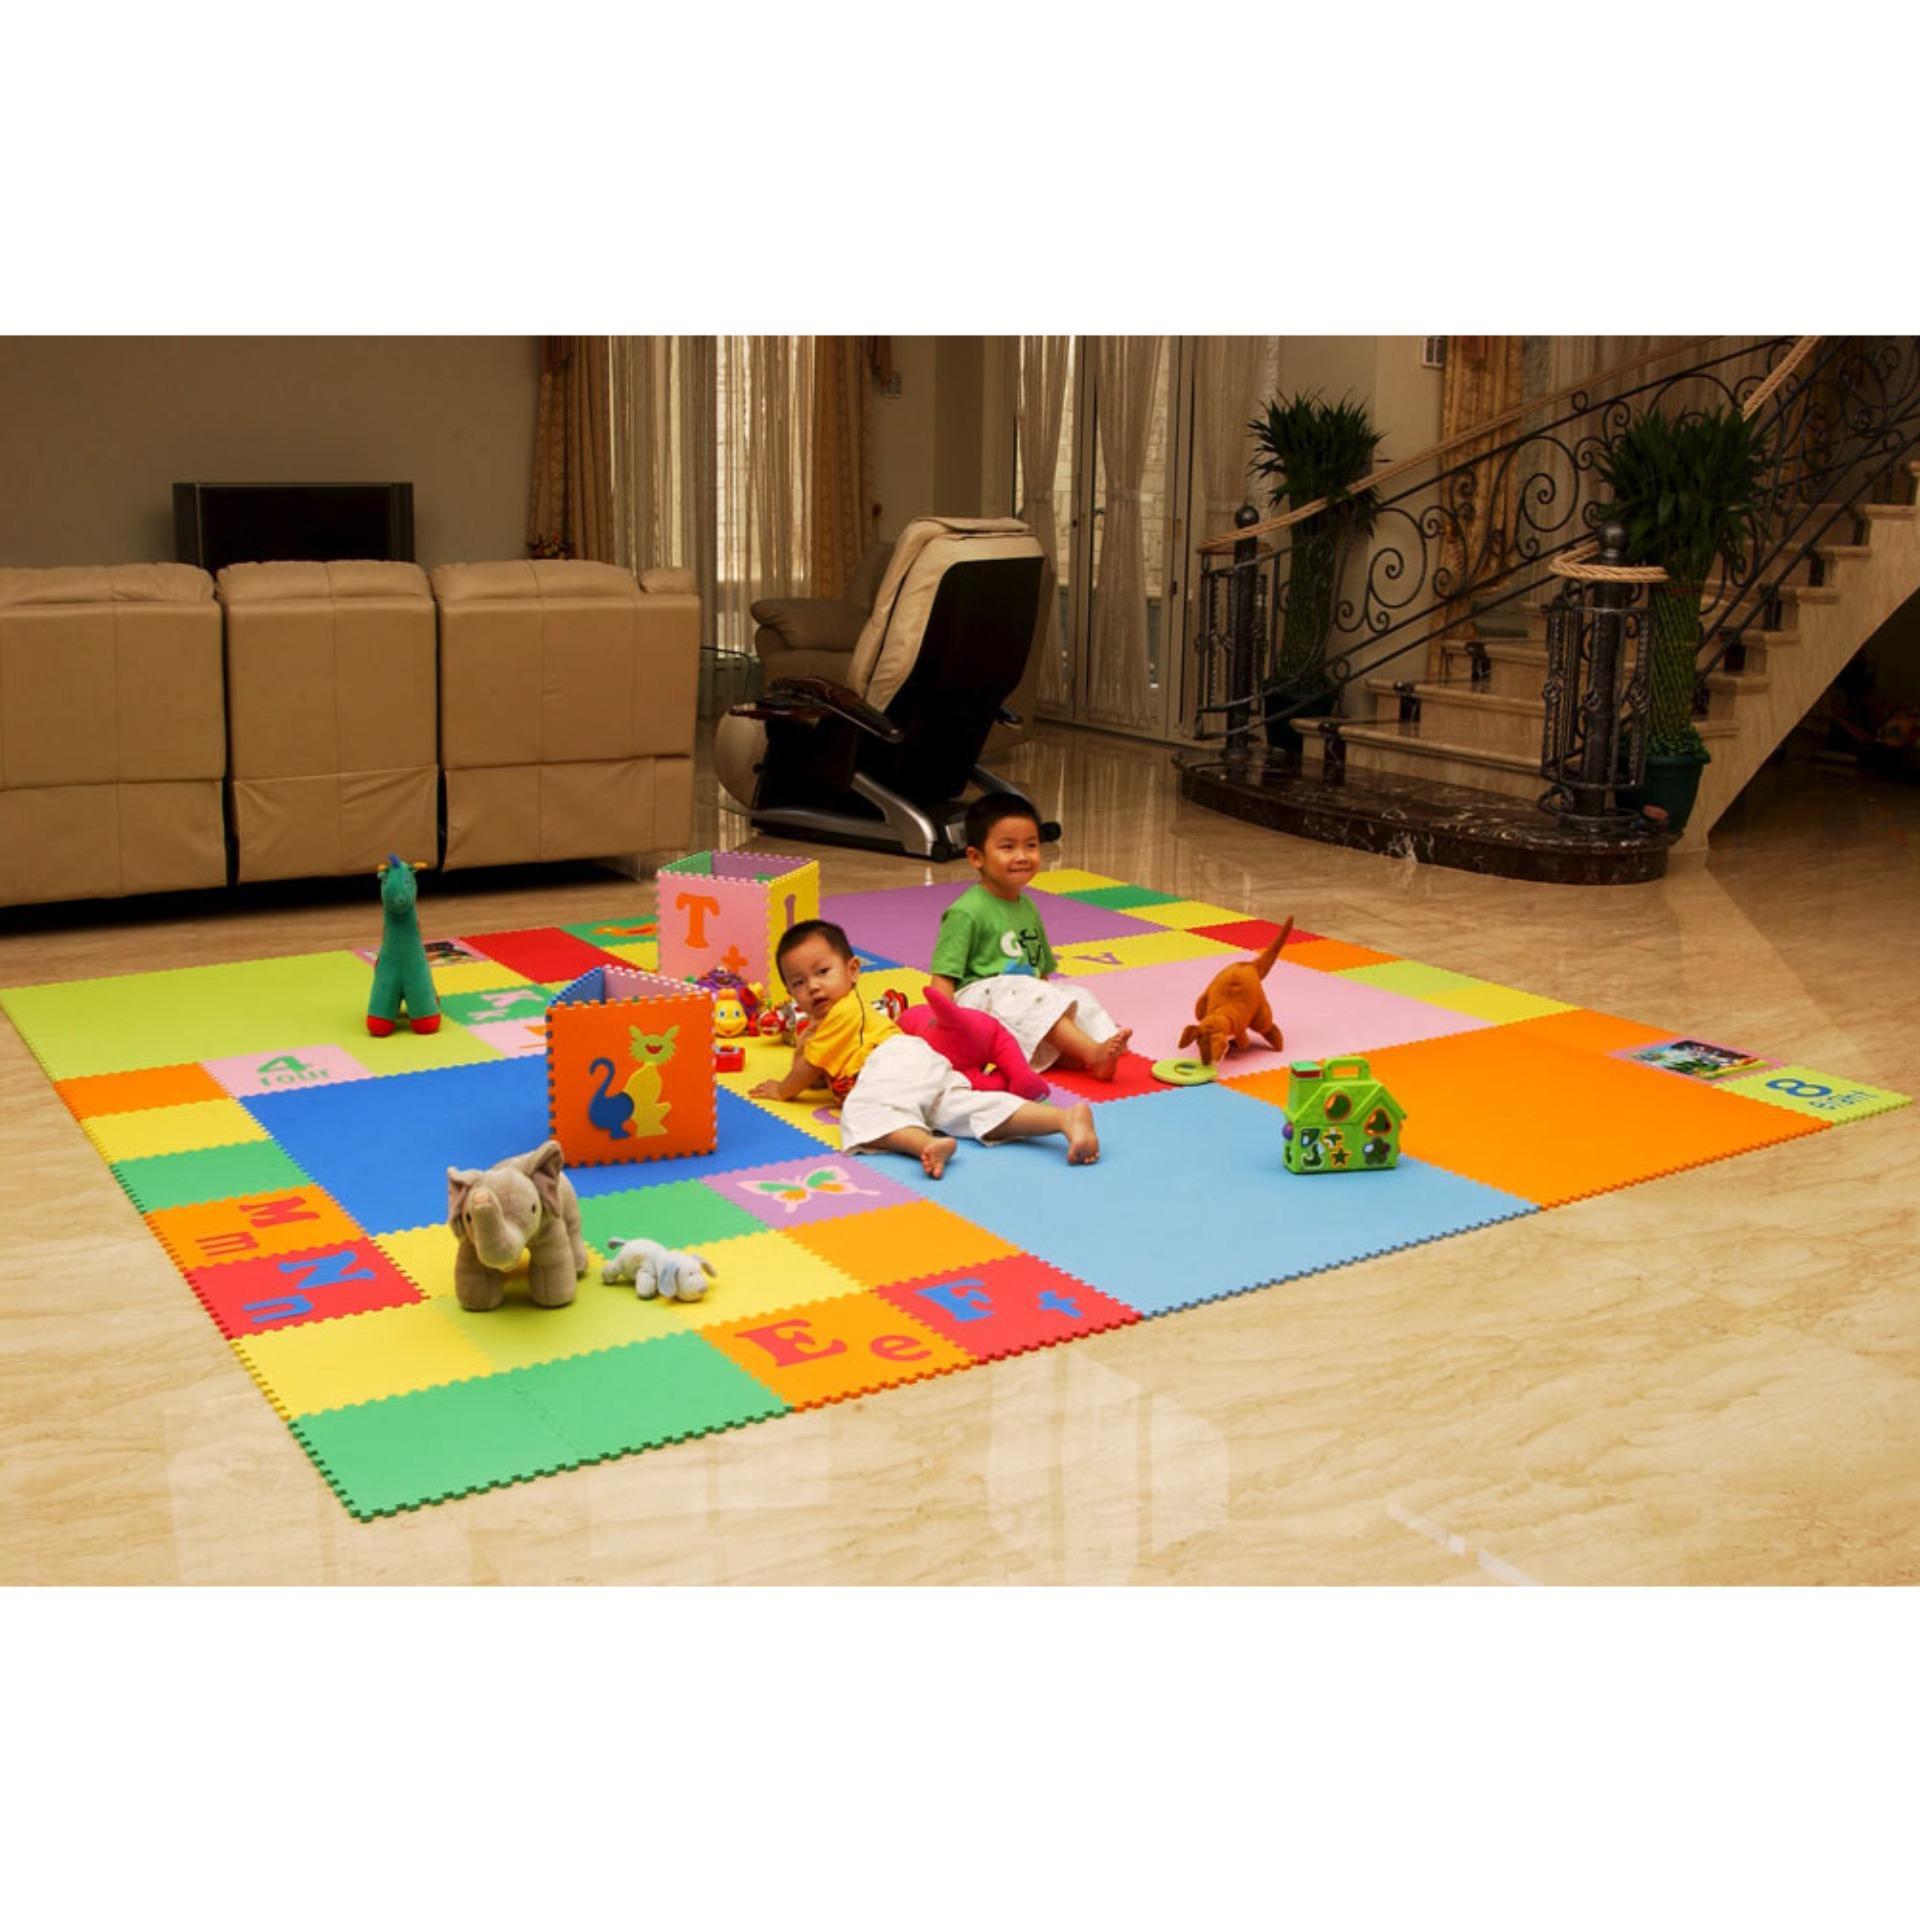 Evamat Polos Matras Tikar Karpet Puzzle Alas Lantai Evamatukuran 30 Evamats Motif Bunga Evamatic Modern Mats Aman Untuk Anak Bermain